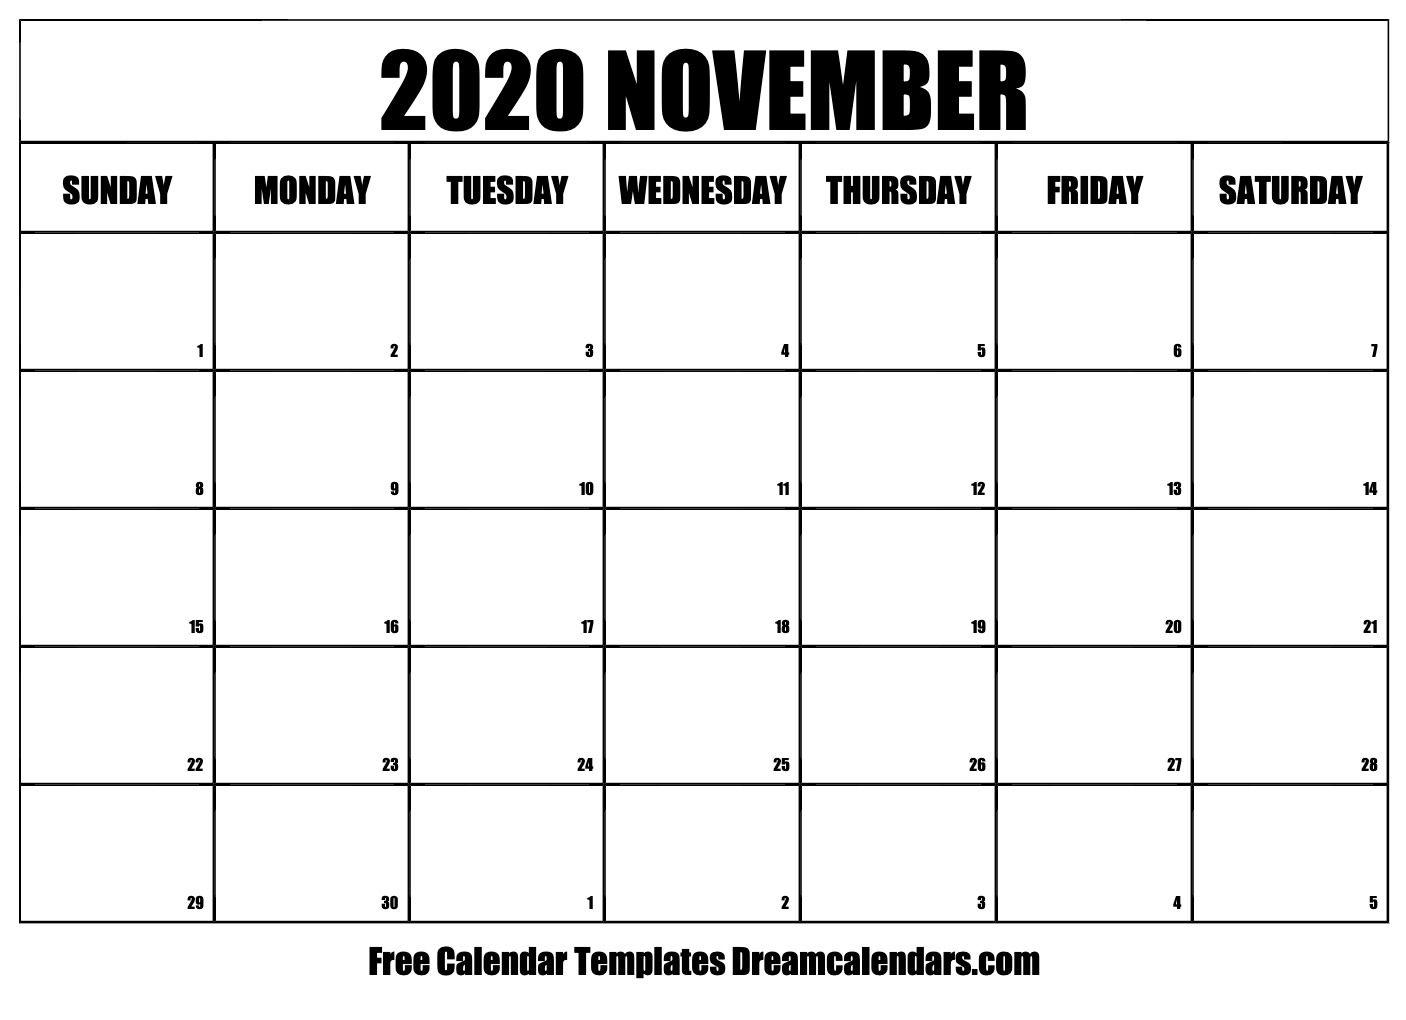 November 2020 Calendar | November Calendar, Free Calendar